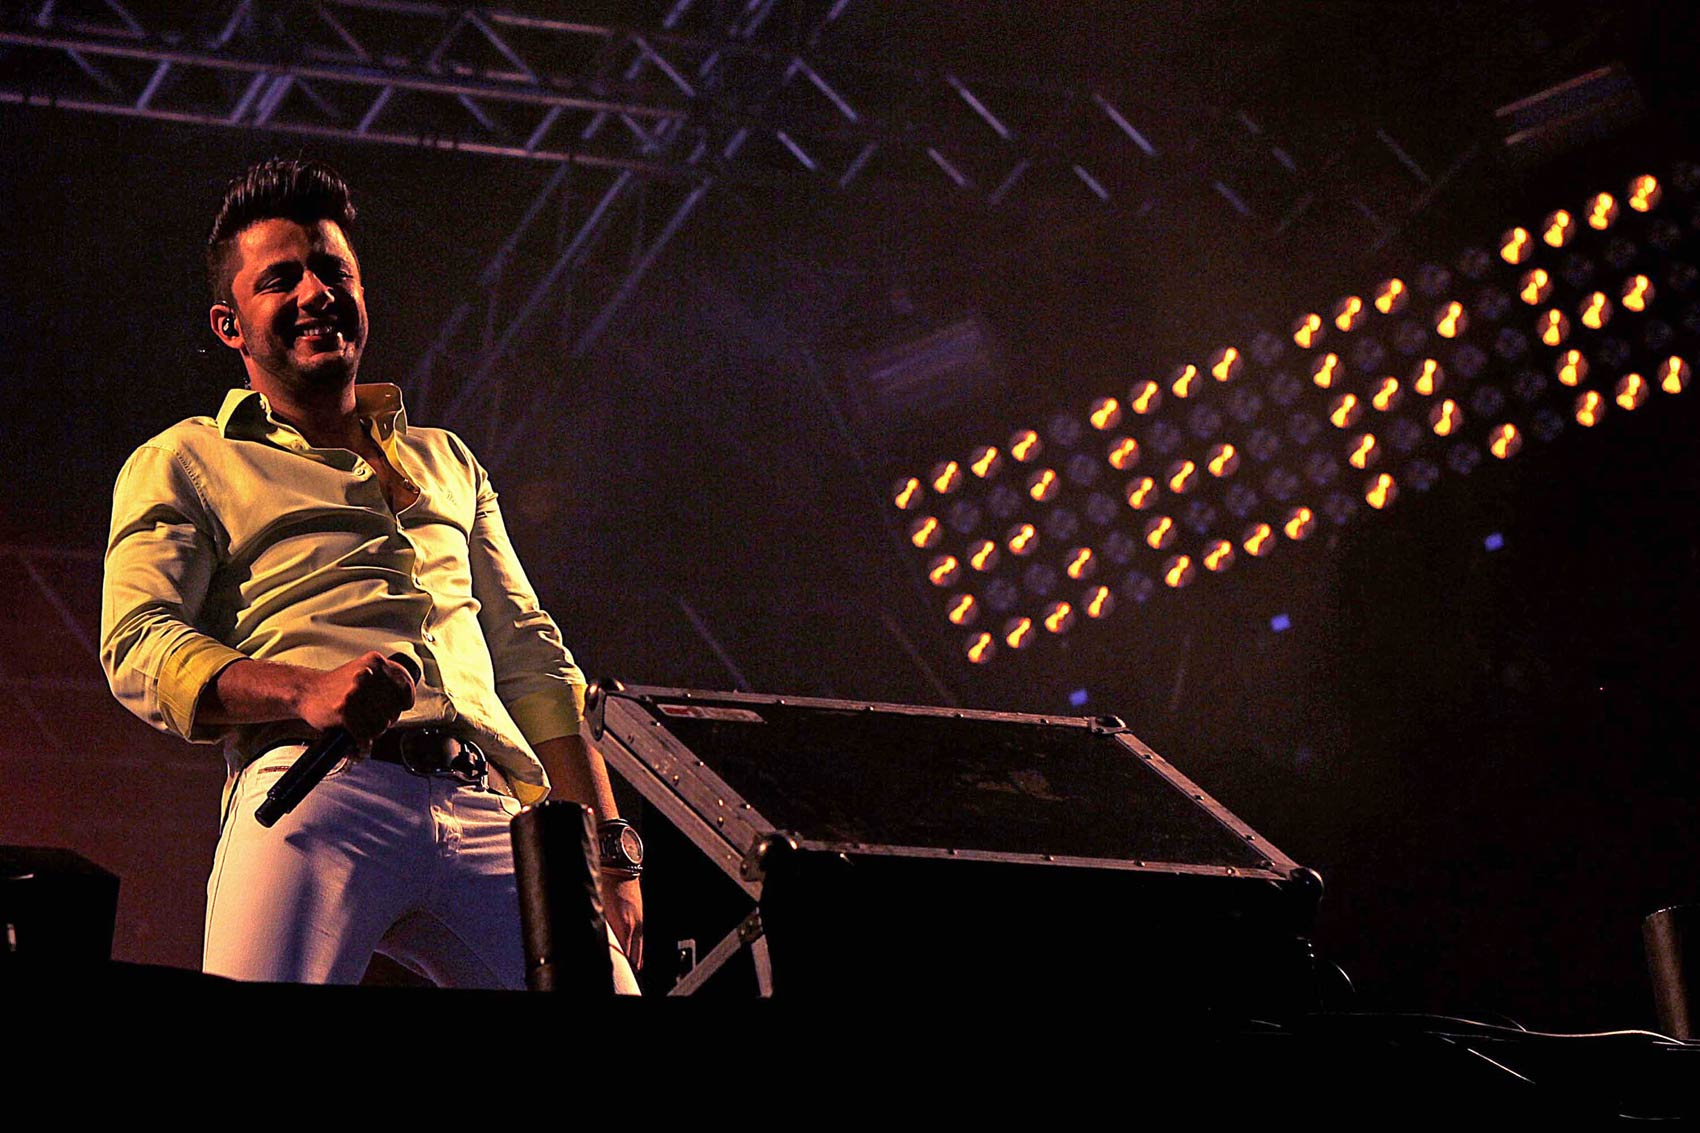 O cantor Cristiano Araújo se apresenta na Expovel, no município de Cascavel (PR), em novembro de 2013